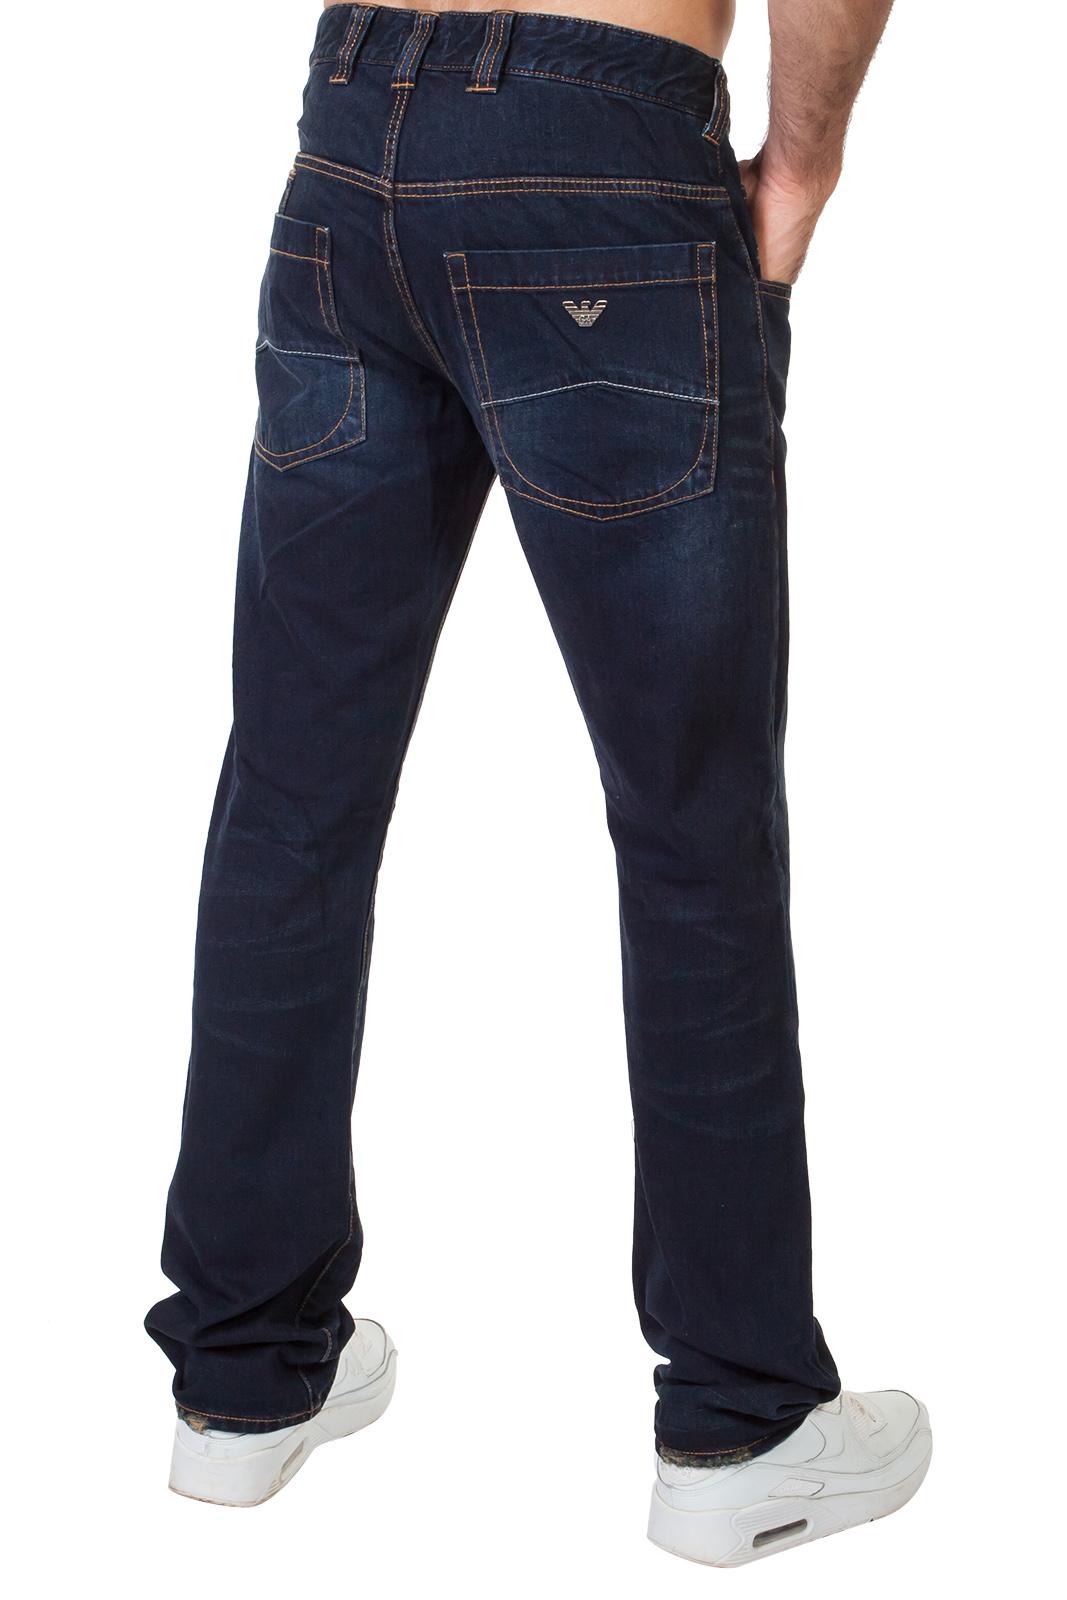 Фирменные Armani Jeans с карманами